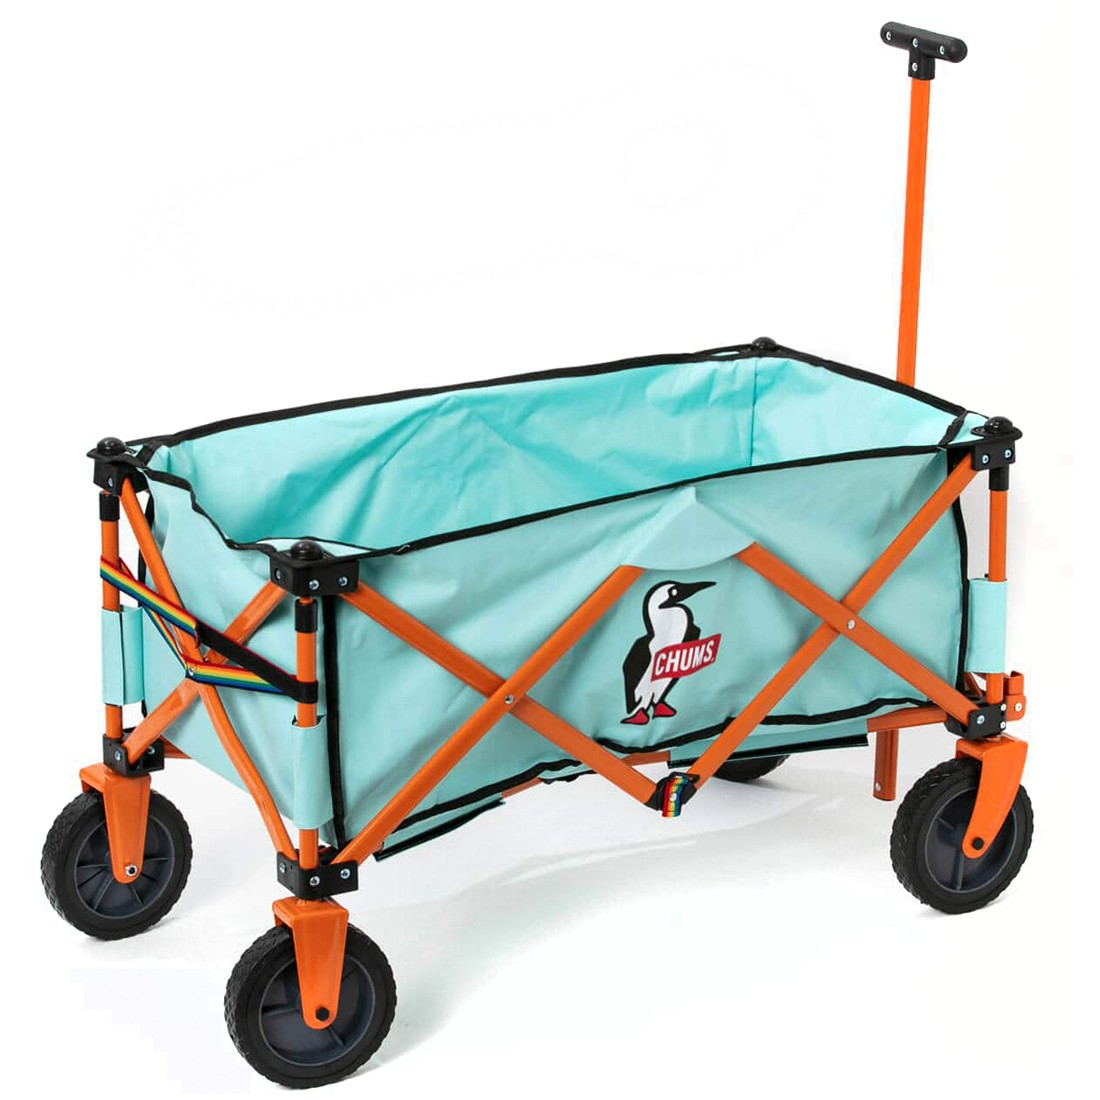 CHUMS Happy Camping FoldingWagon